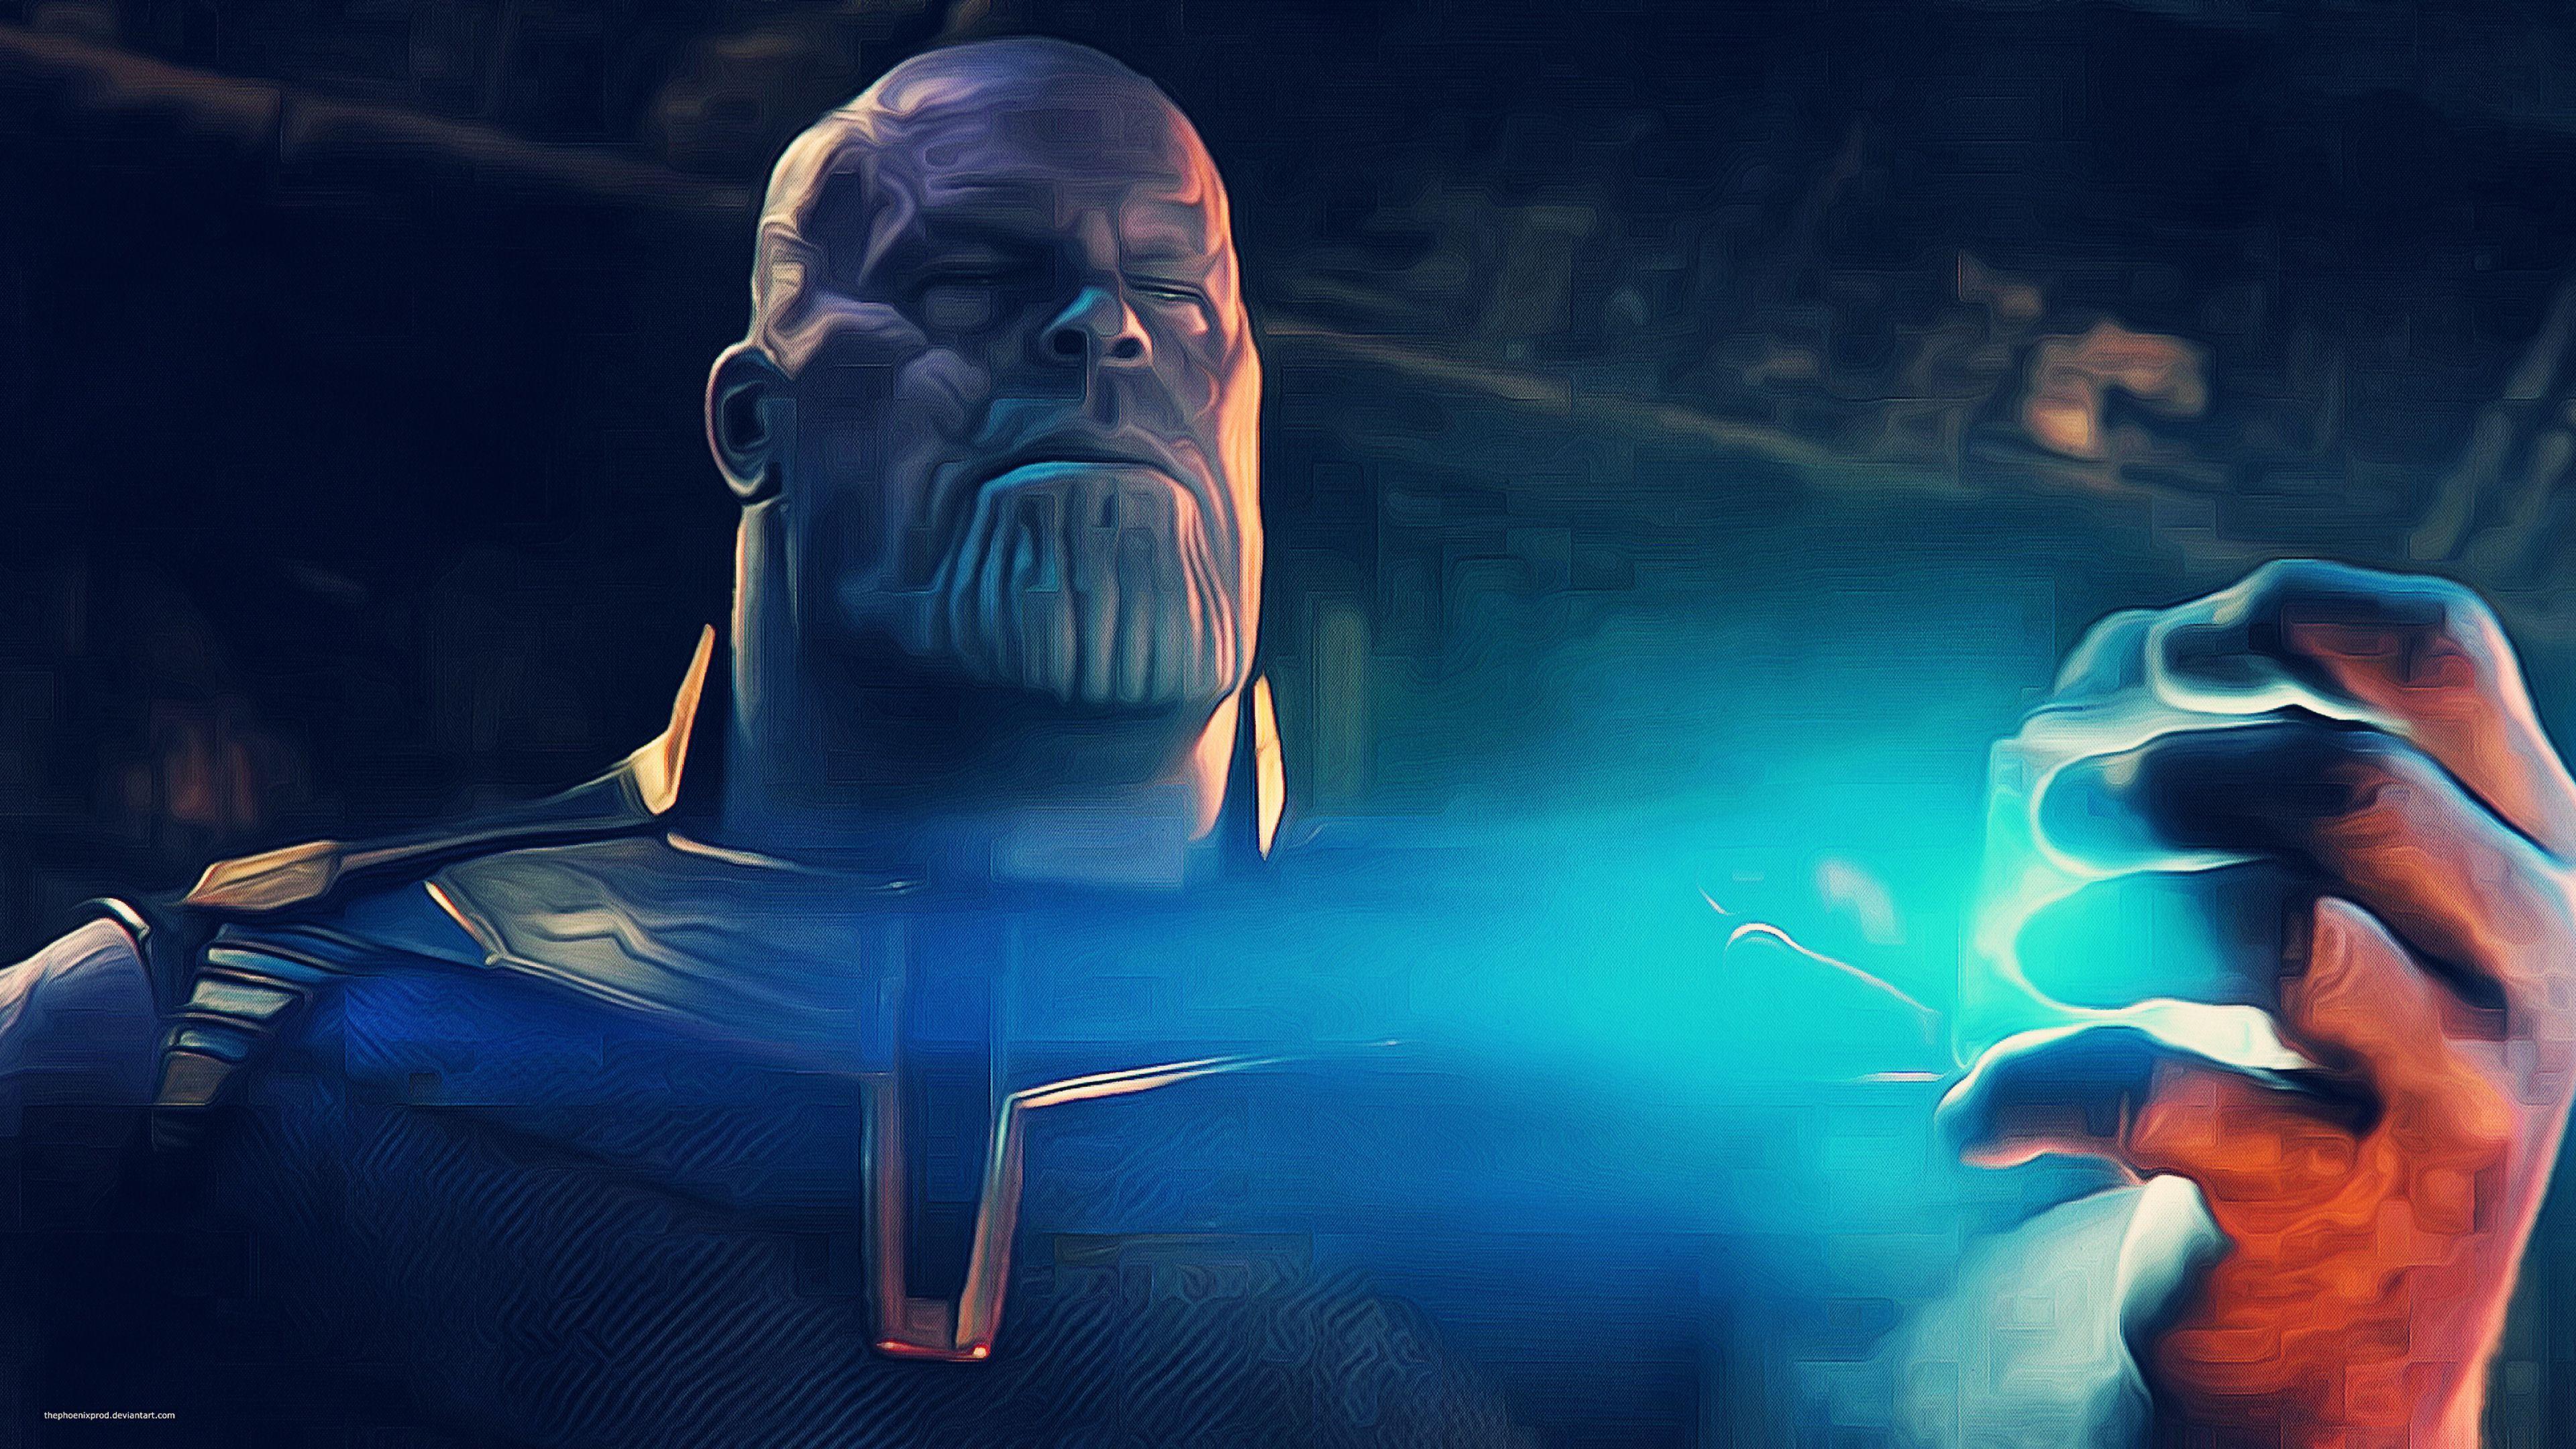 Thanos 4K Digital Wallpapers - Top Free Thanos 4K Digital